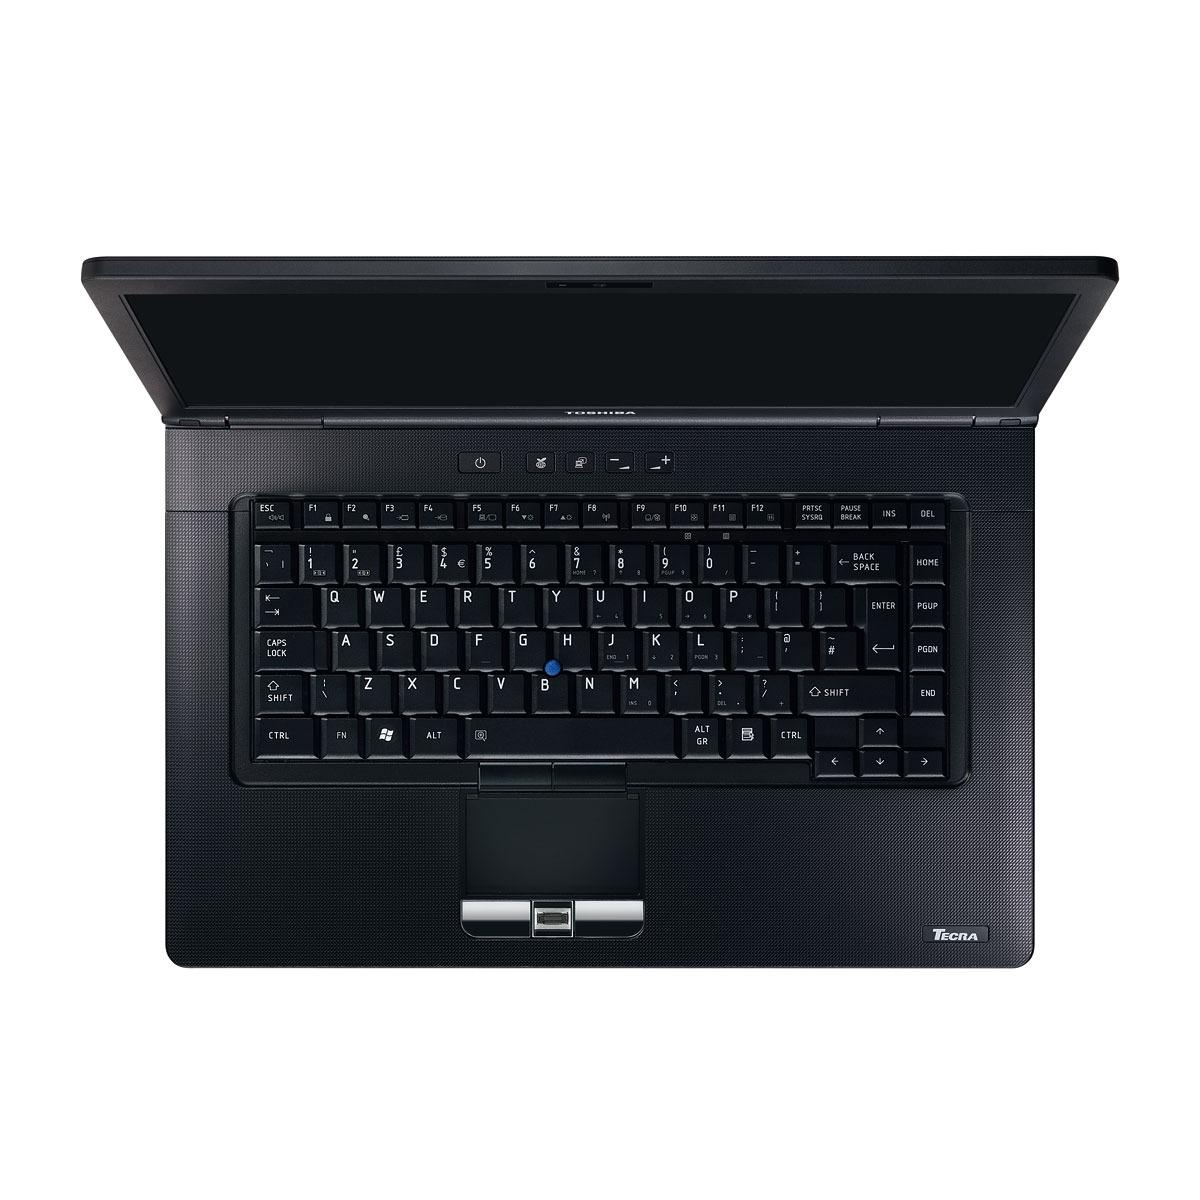 Toshiba Tecra S11 15G PTSE3E 0DR04UFR Achat Vente PC